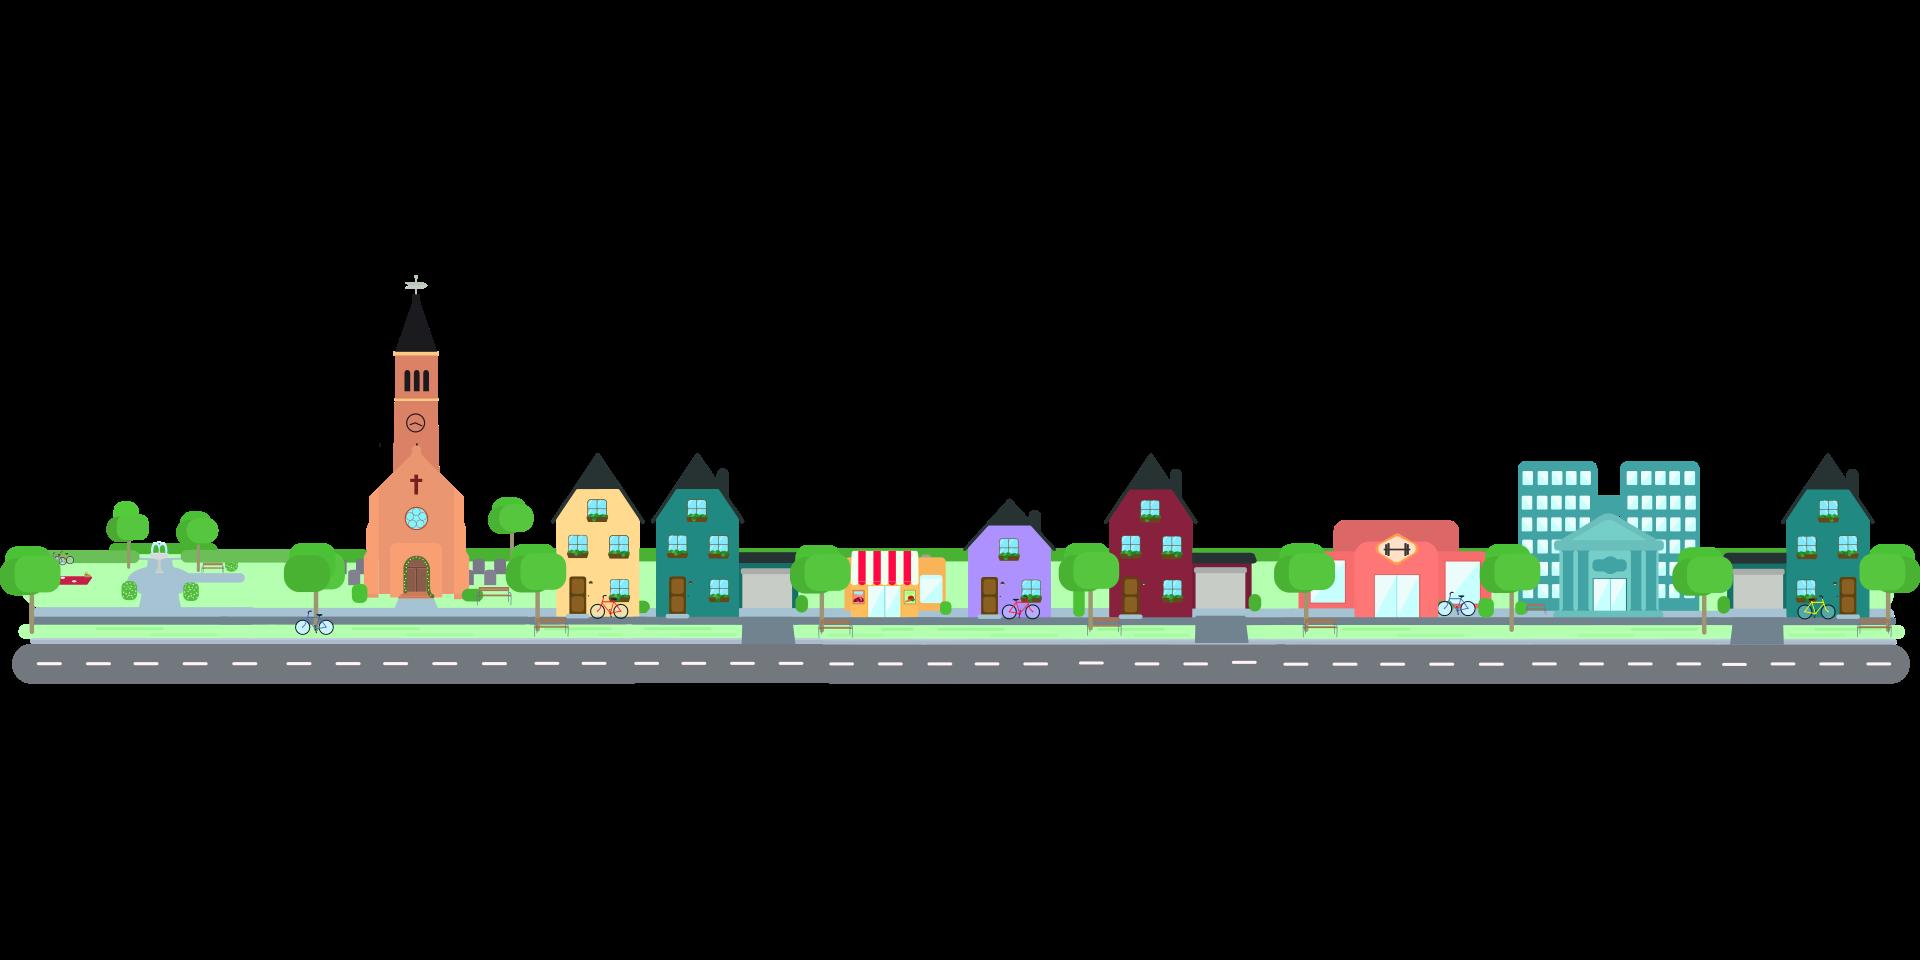 investir-dans-immobilier-neuf-2018-bertrand-demanes